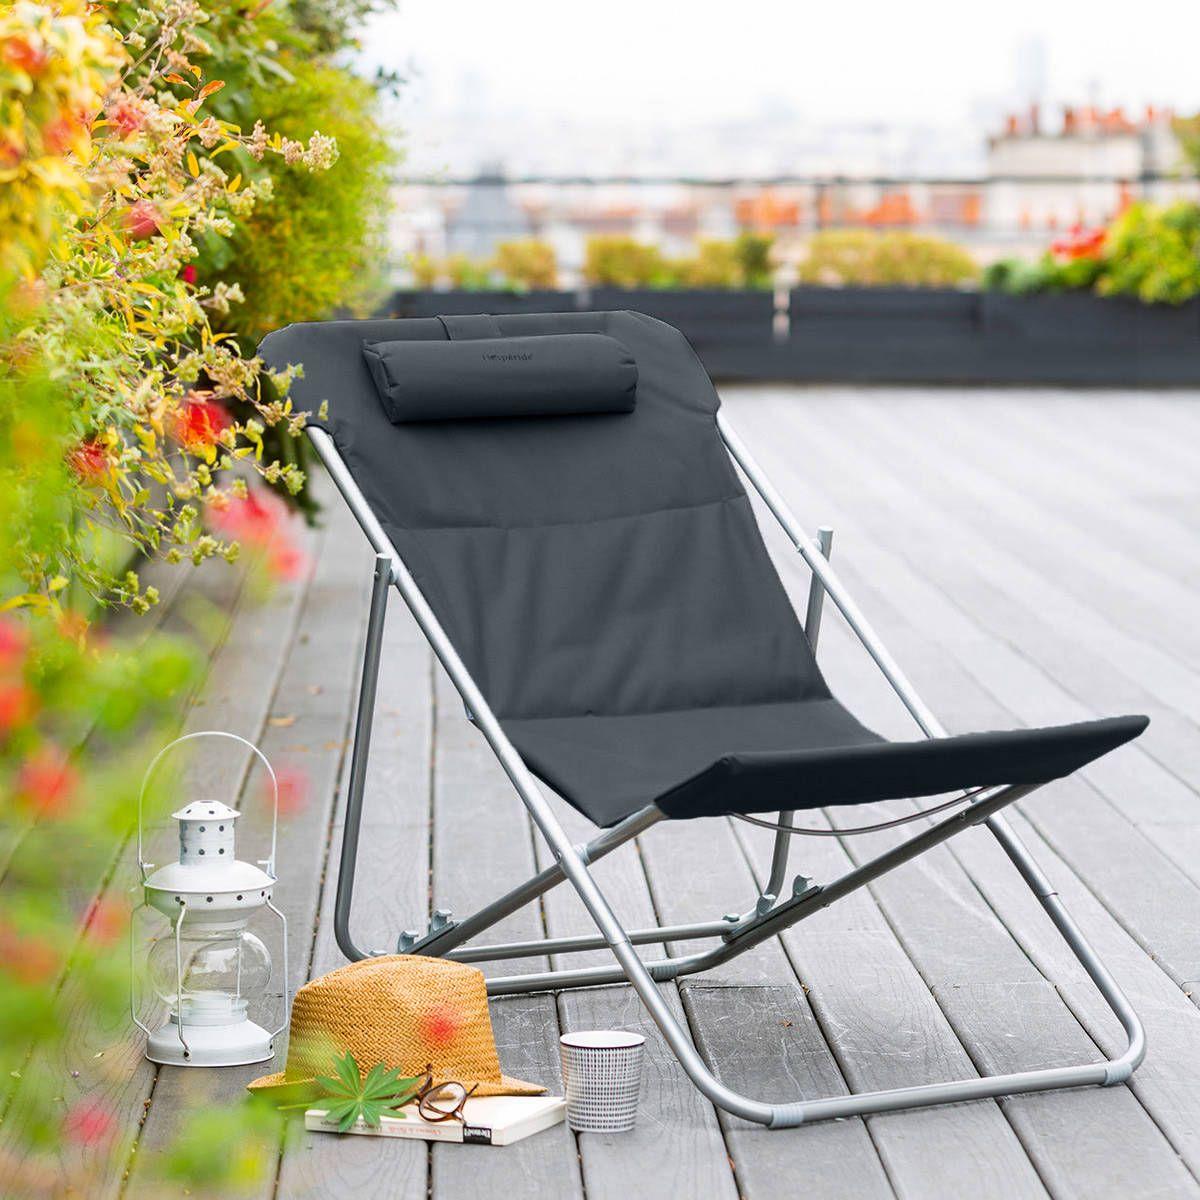 Chilienne De Jardin Pliante Bilbao Ardoise Petite Terrasse Chaise Longue Meubles De Jardin Design